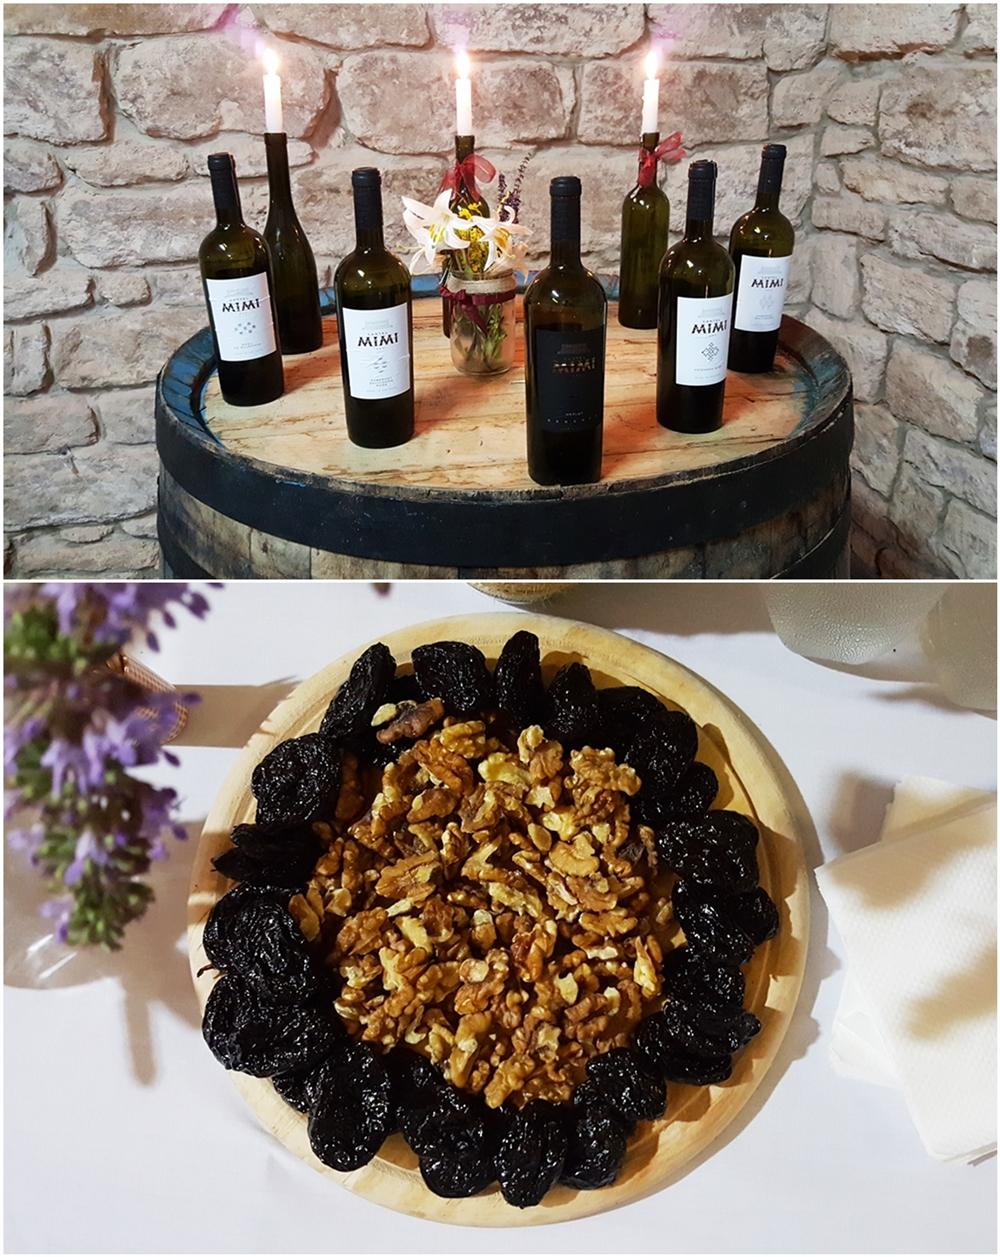 mimi winery